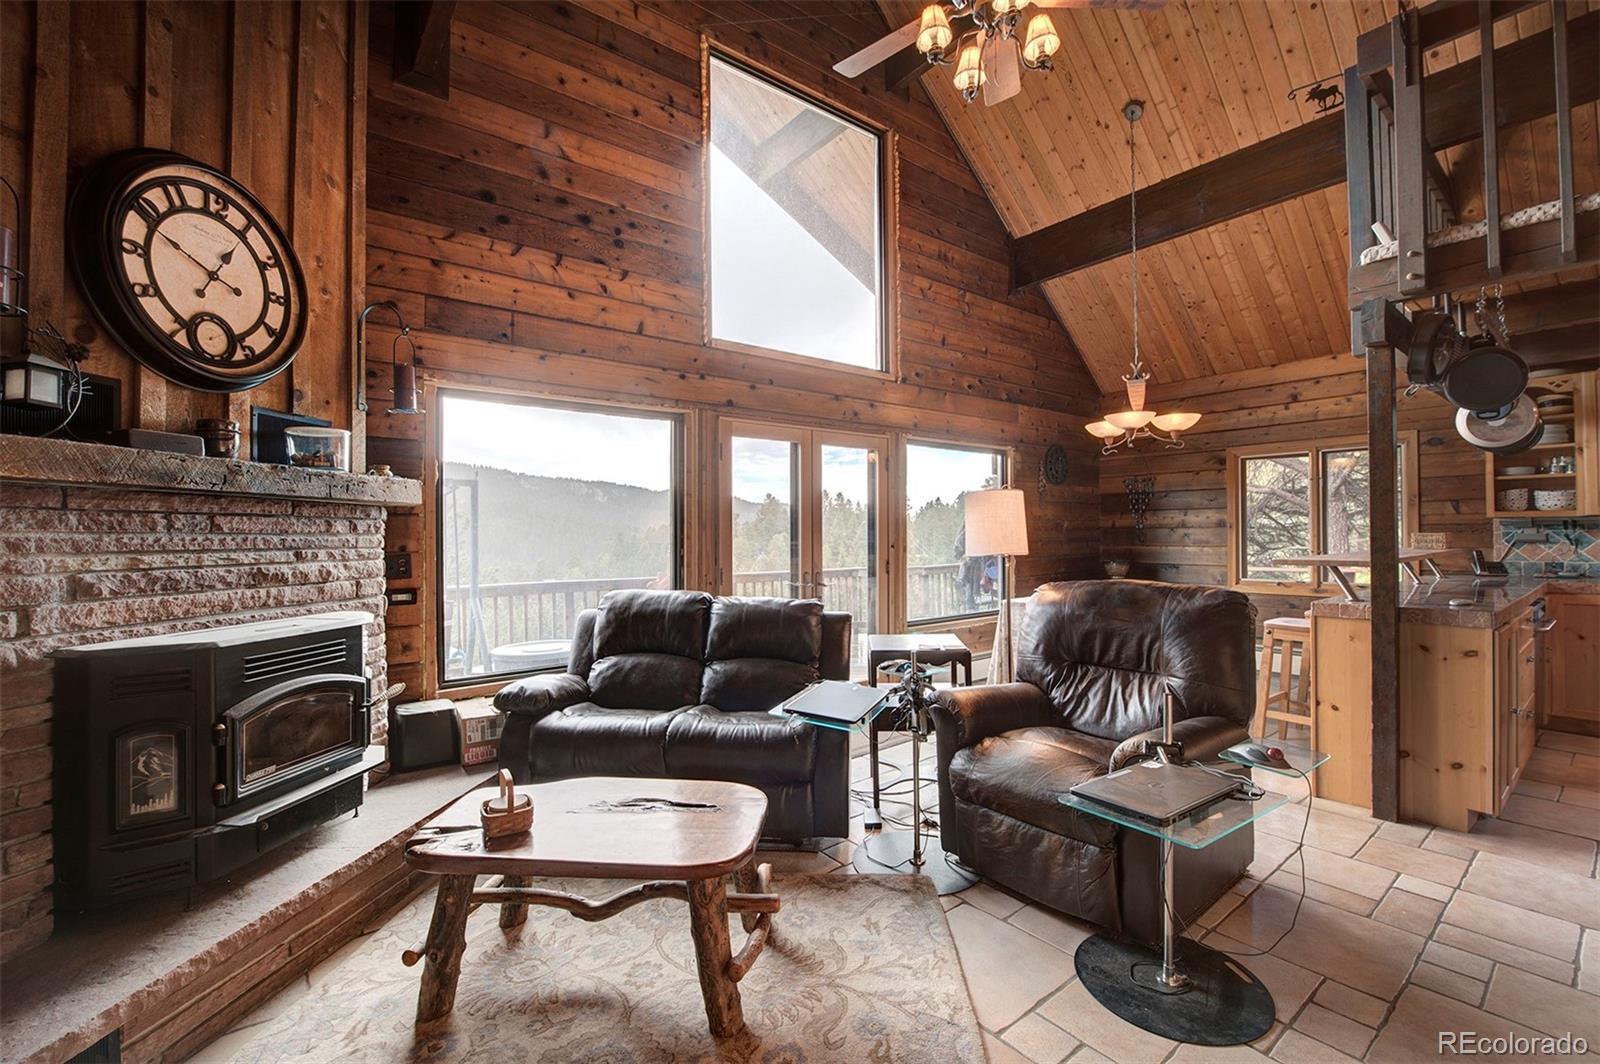 MLS# 6922377 - 5 - 12123 Geronimo Trail, Conifer, CO 80433